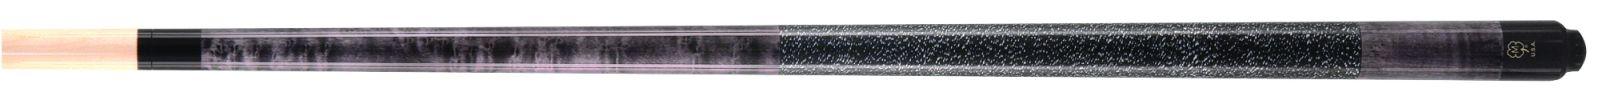 mcdermott gs06 titanium grey piljardikii